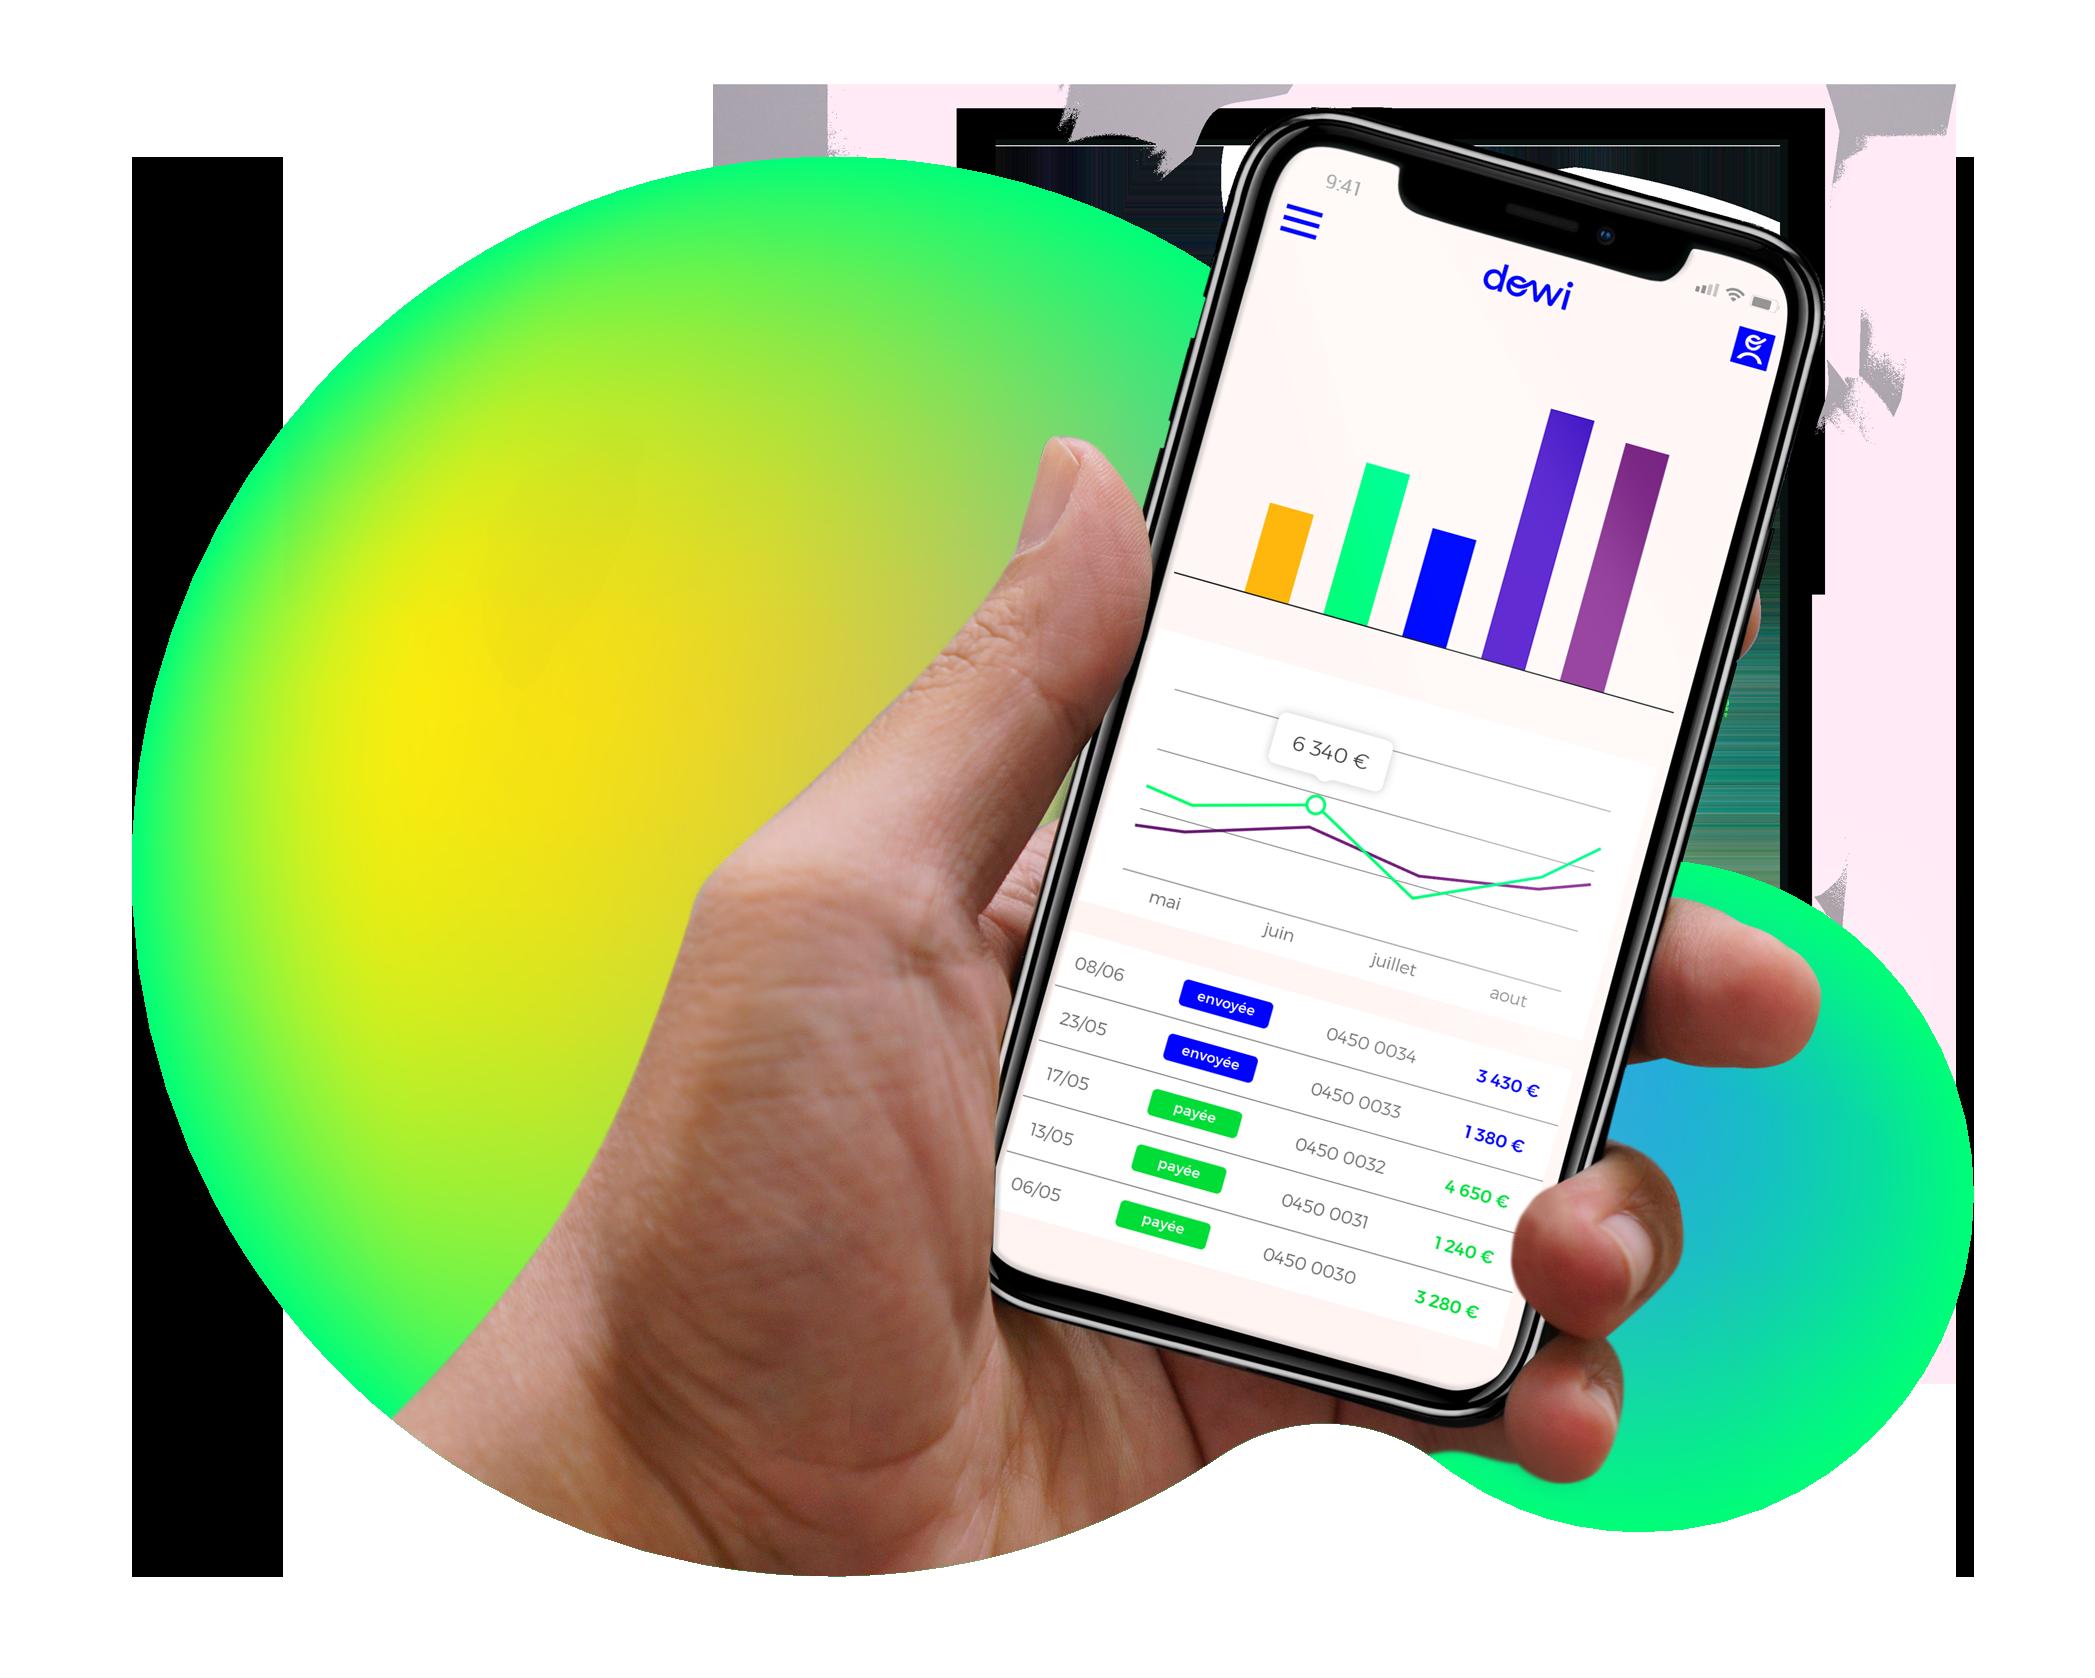 dowi - Expert comptable en ligne